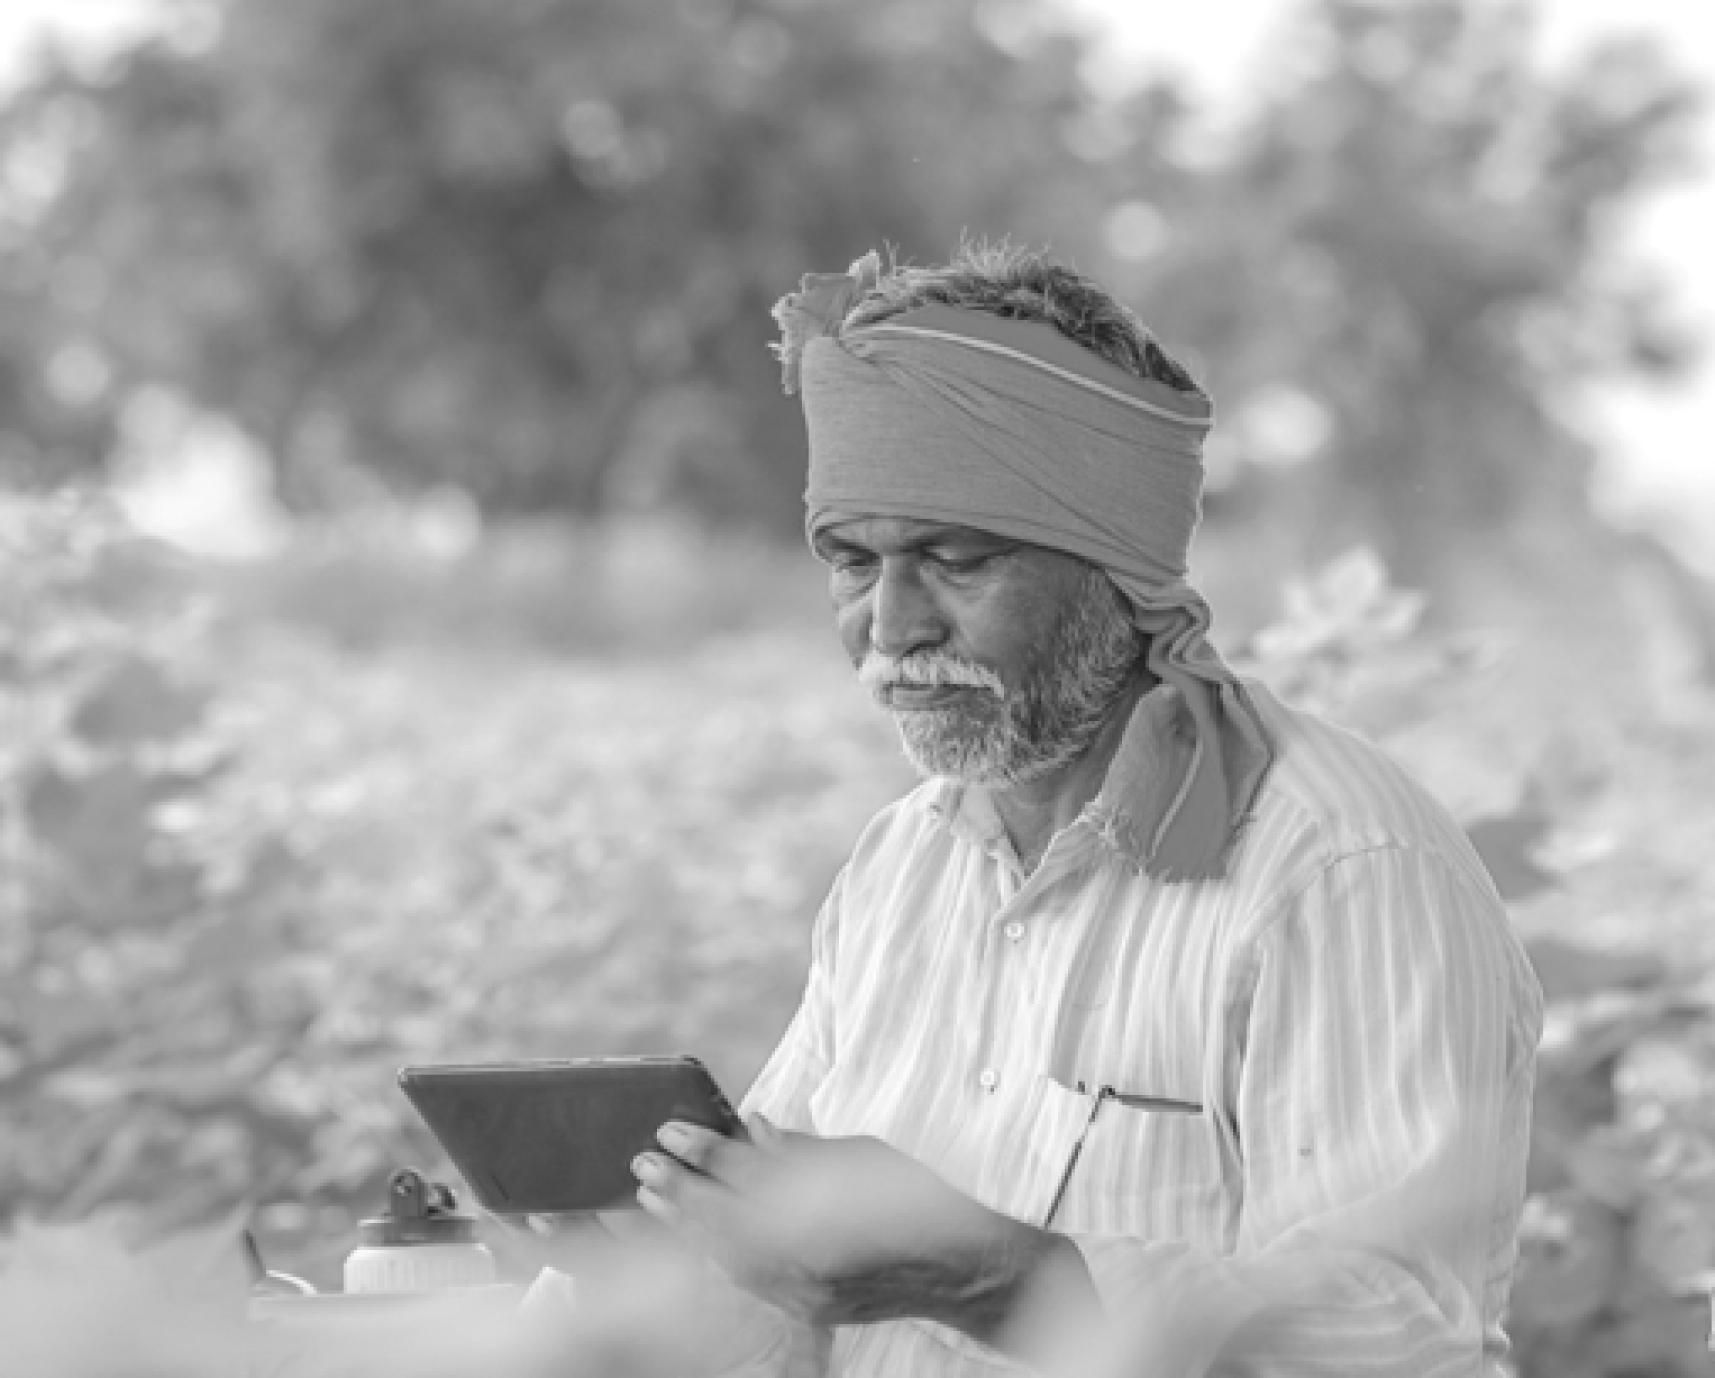 An elderly indian farmer using a phone